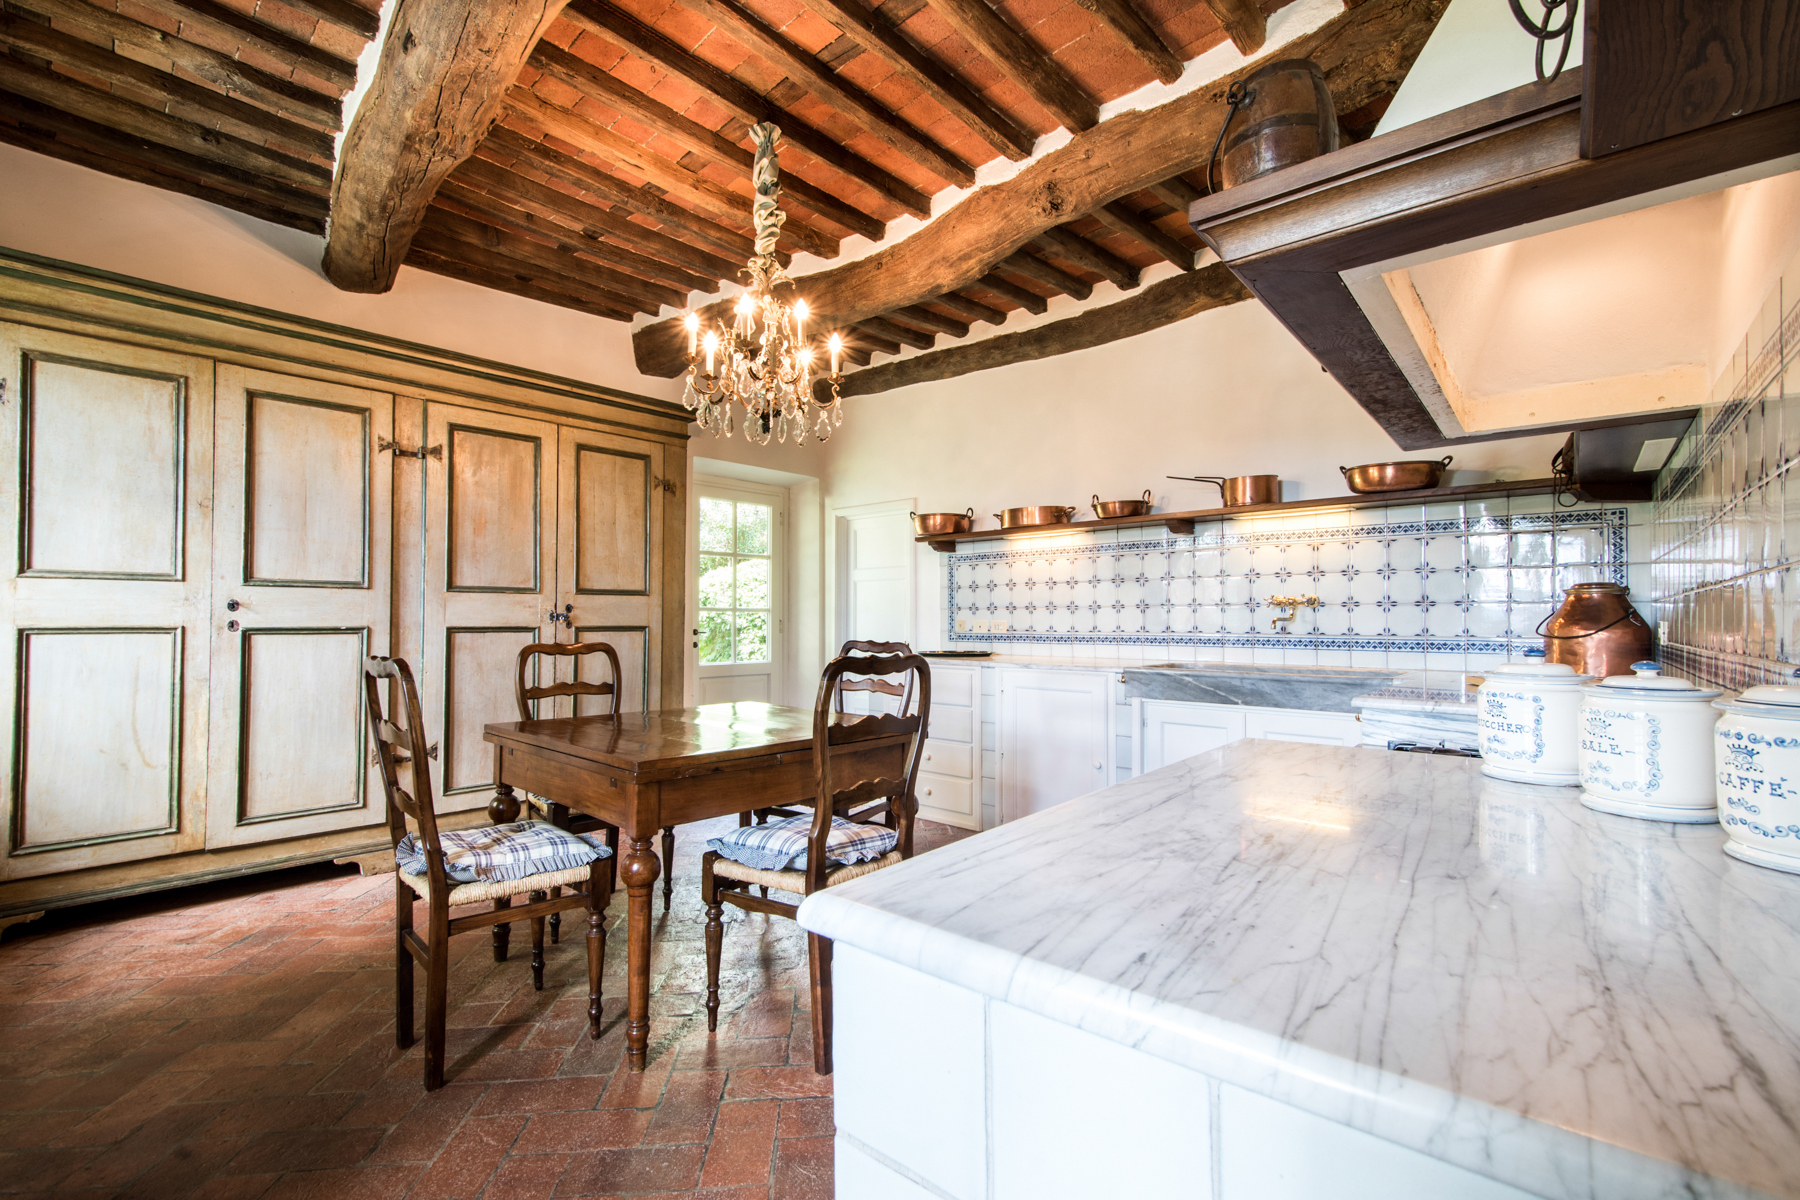 Villa in Vendita a Lucca: 5 locali, 1065 mq - Foto 21